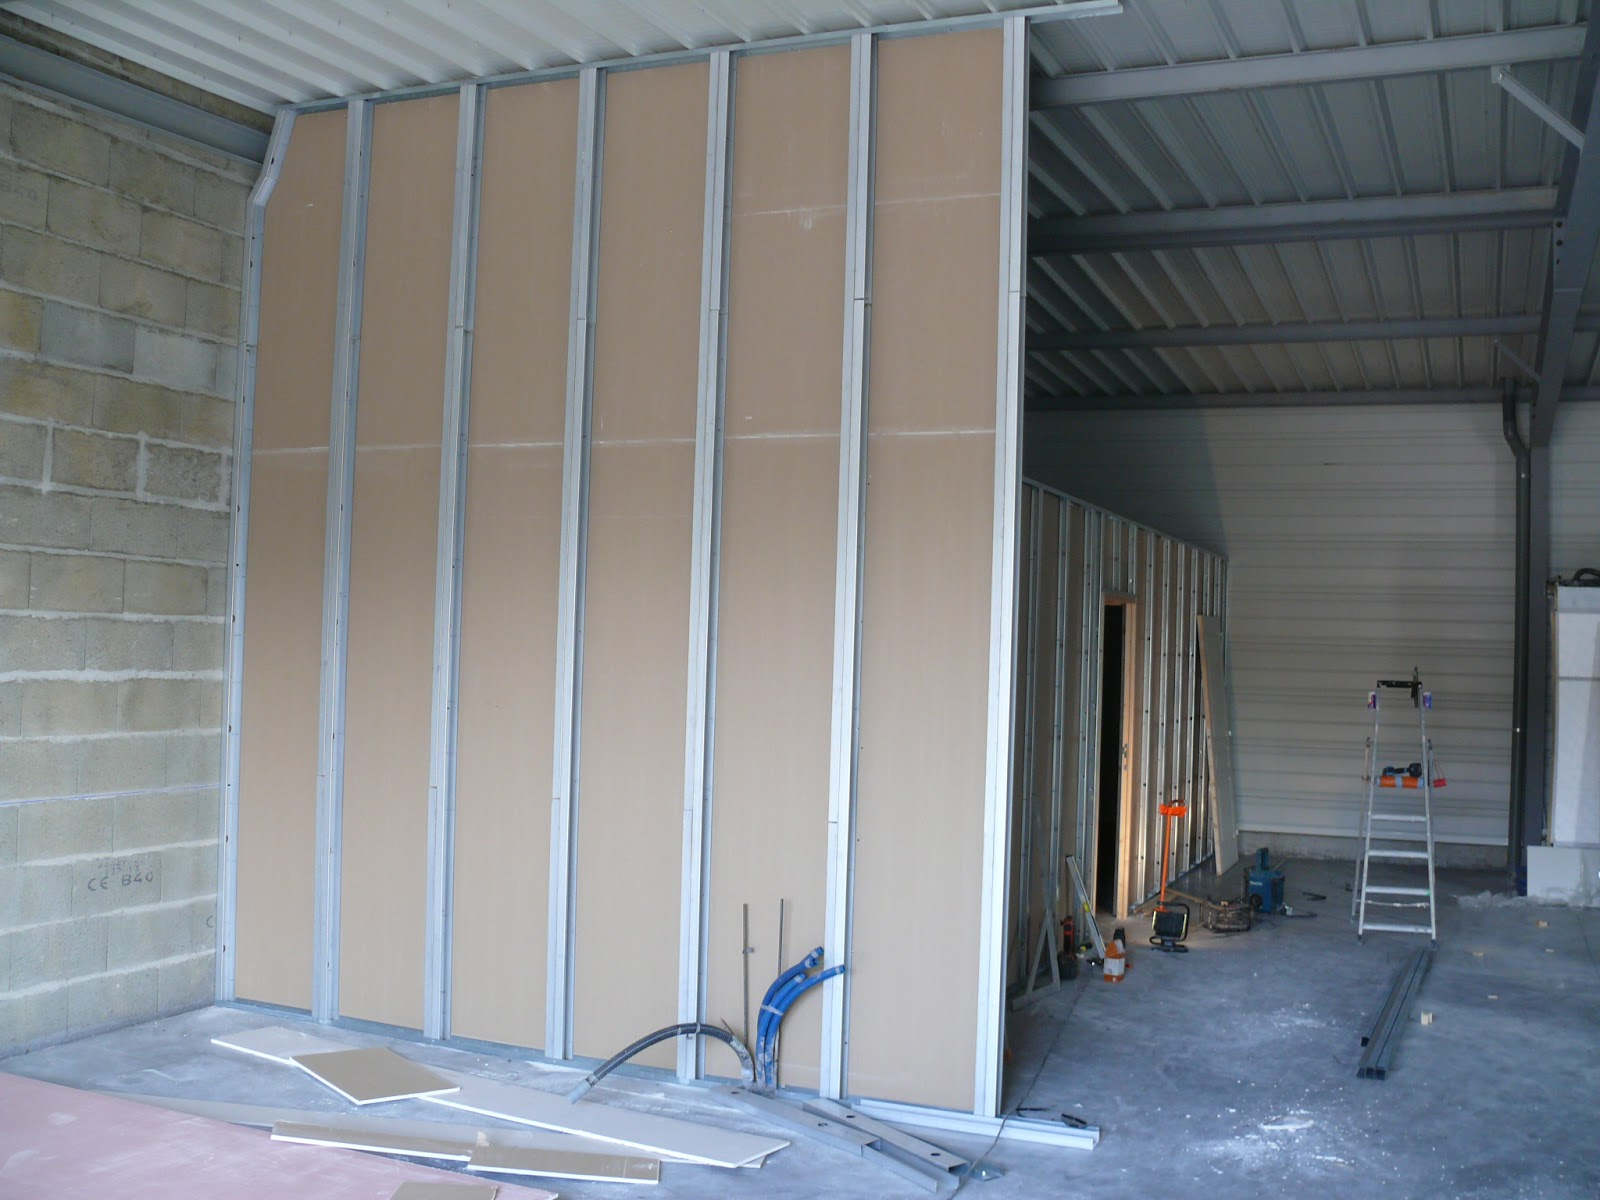 biocoop du lac saint philbert de grand lieu l 39 heure du placo. Black Bedroom Furniture Sets. Home Design Ideas